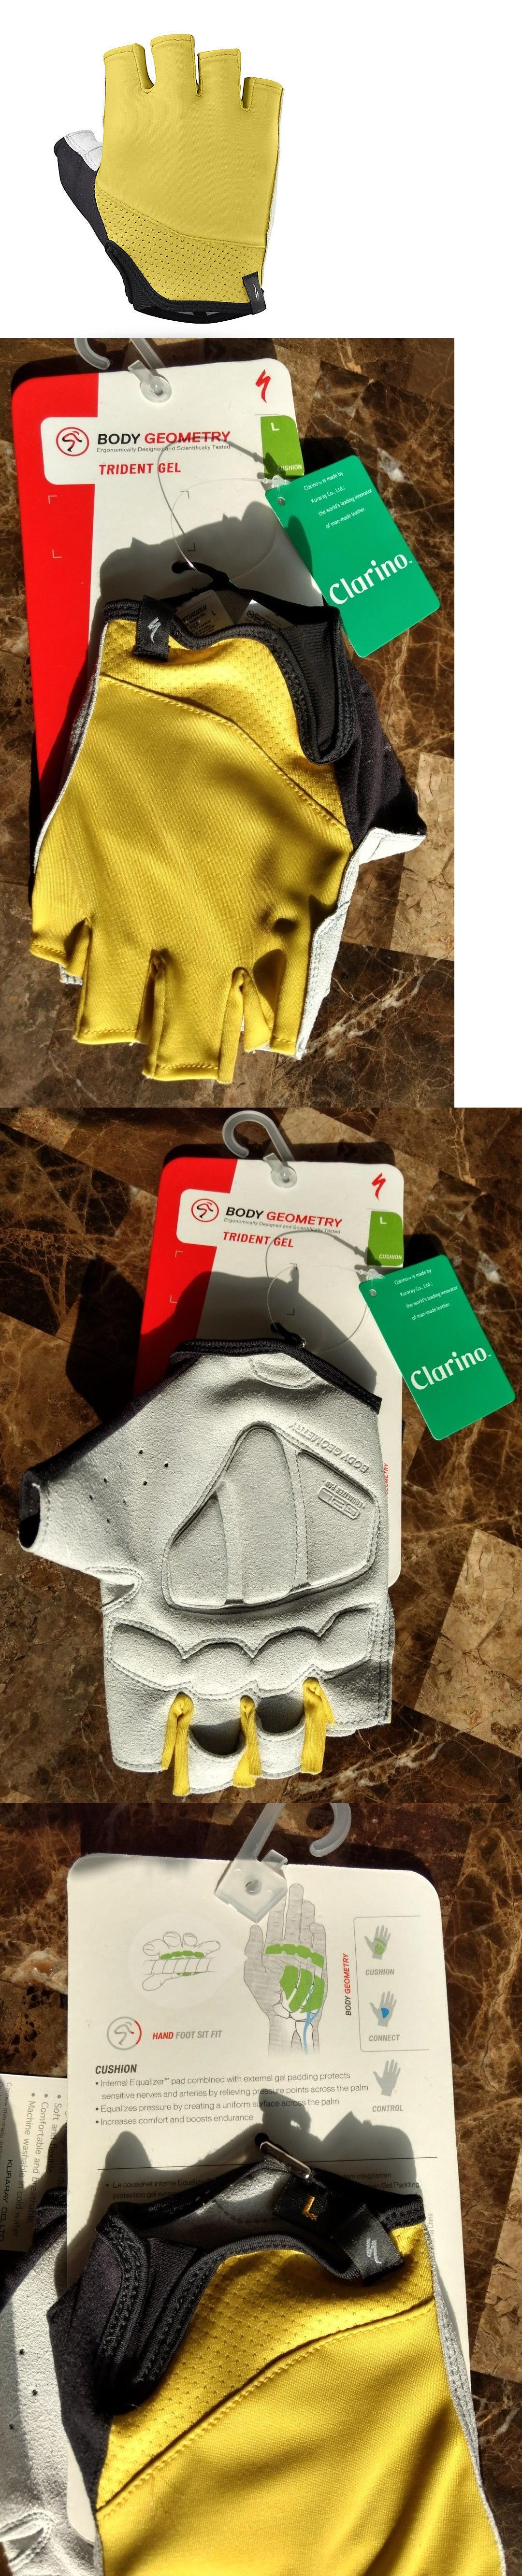 Gloves specialized trident gel gloves men s large mustard